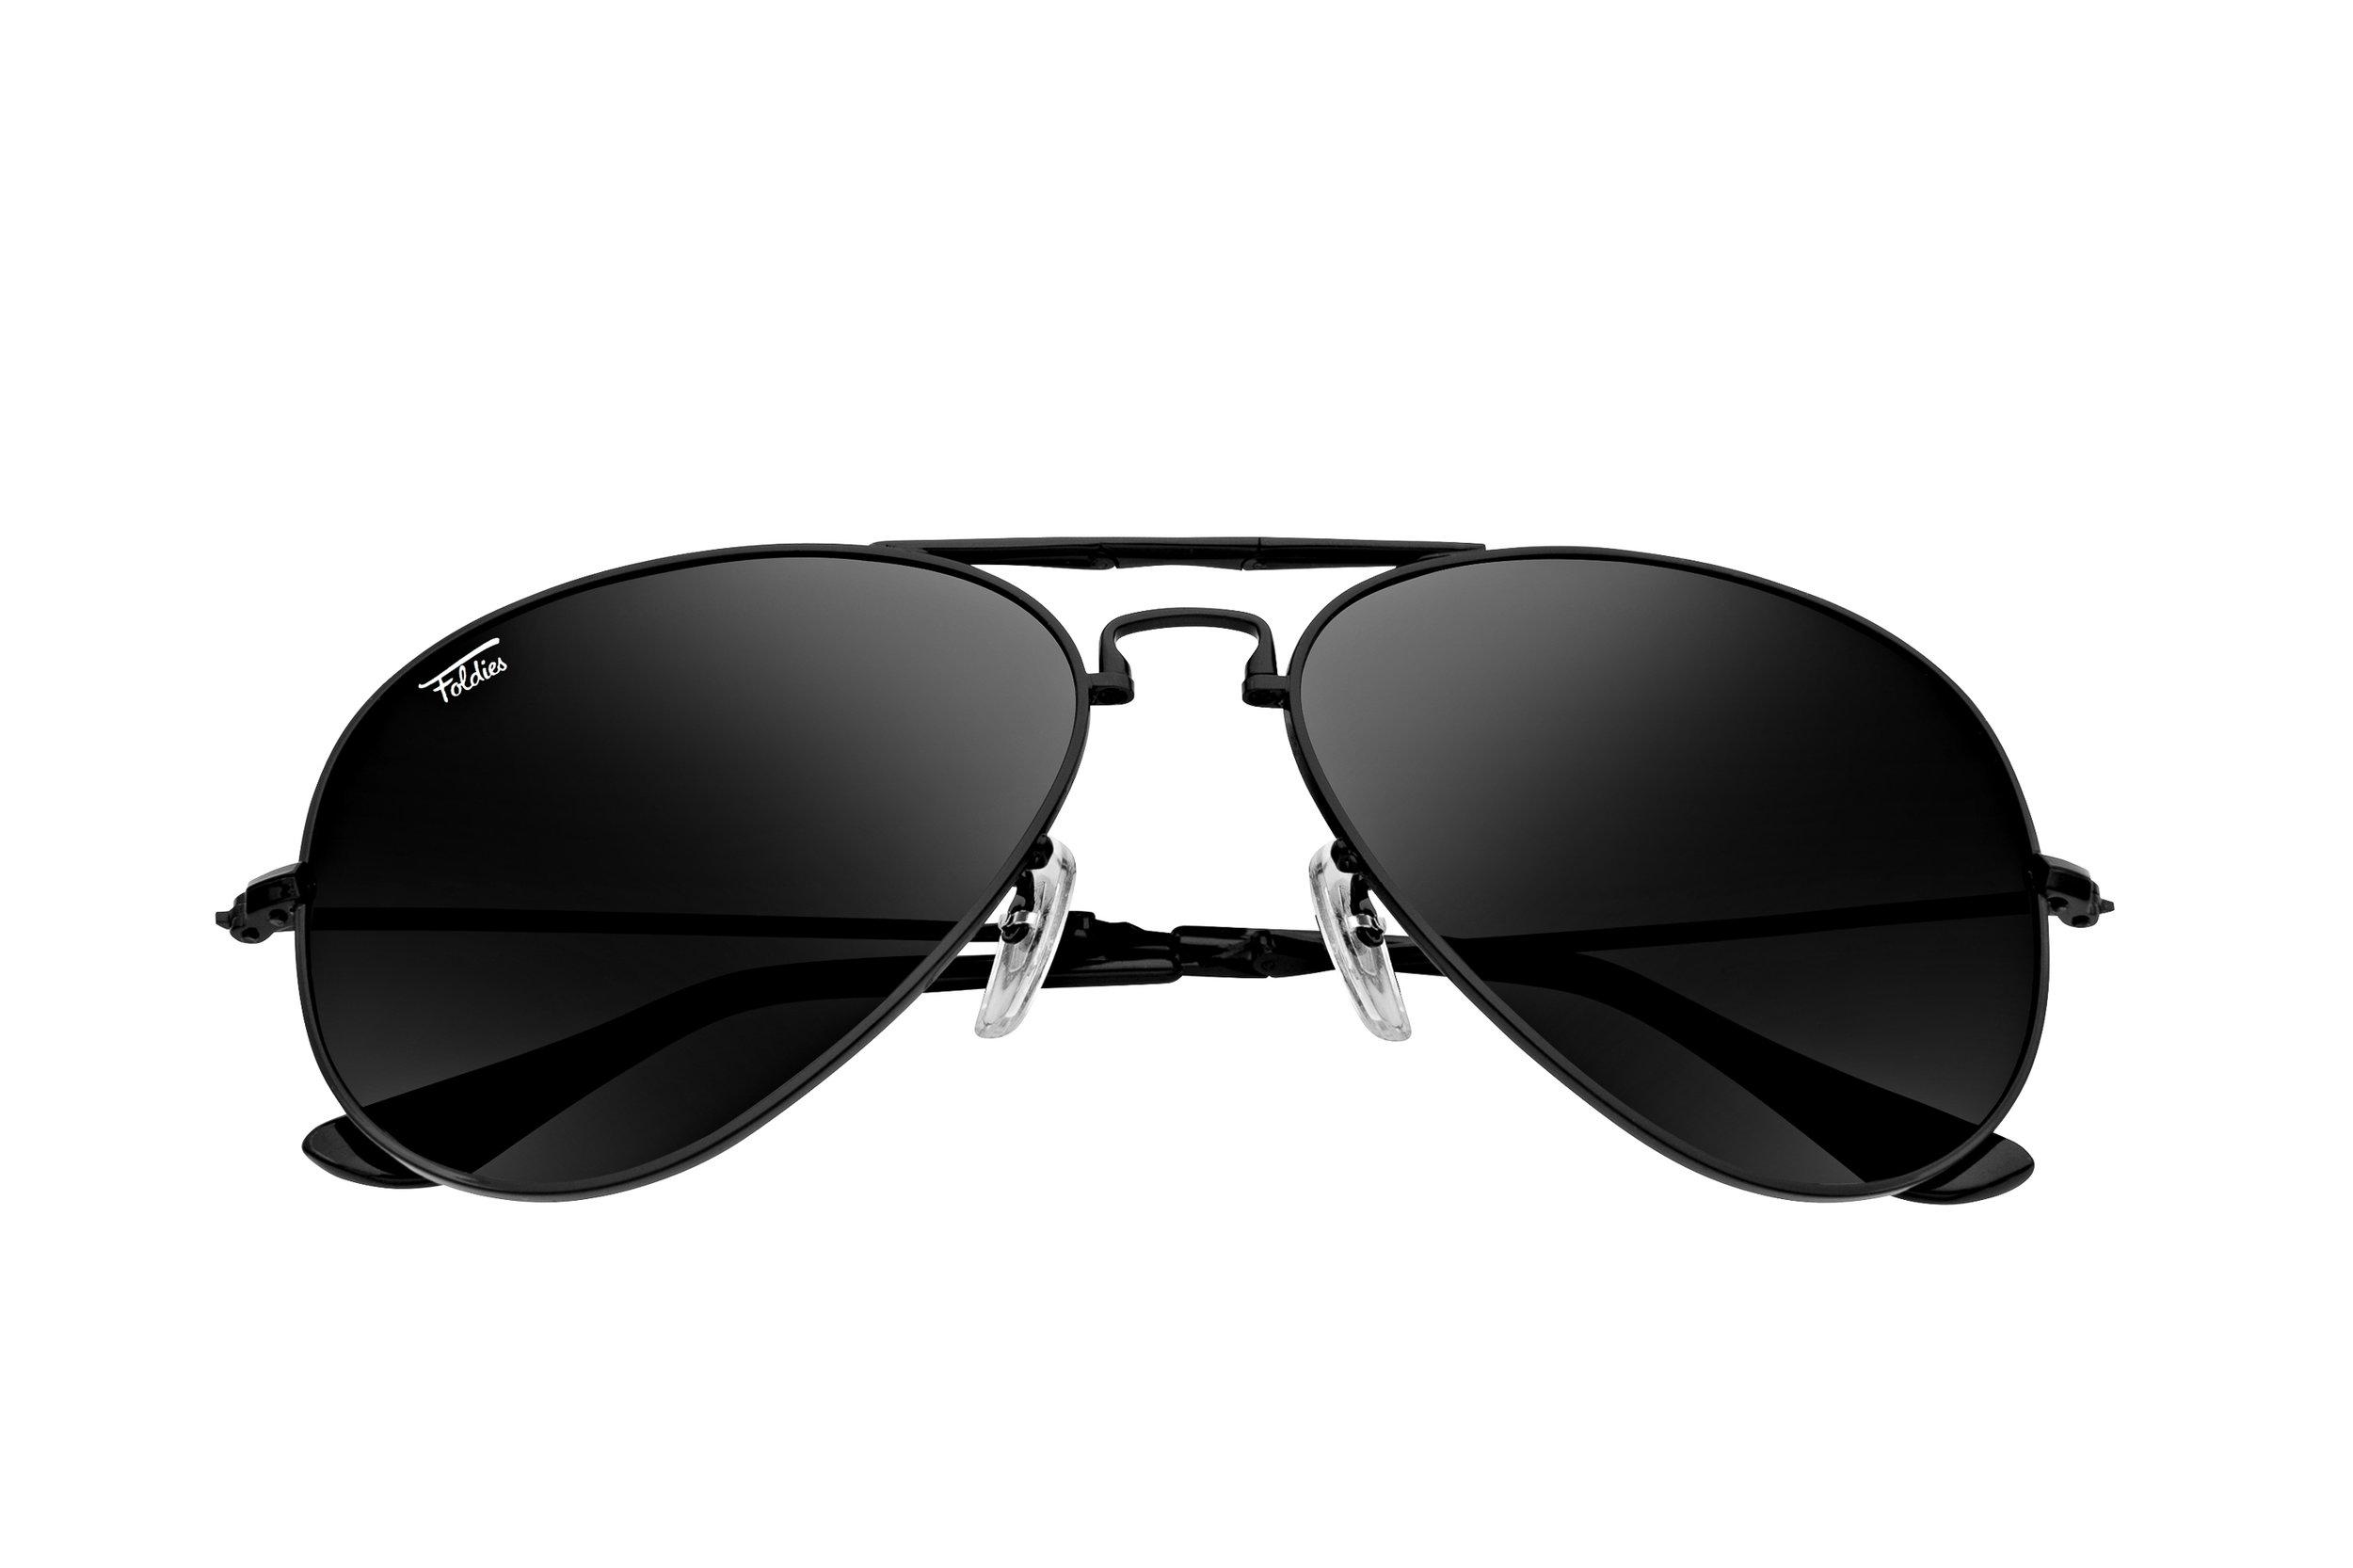 foldies-Aviators-sunglasses-front_black_black.jpg